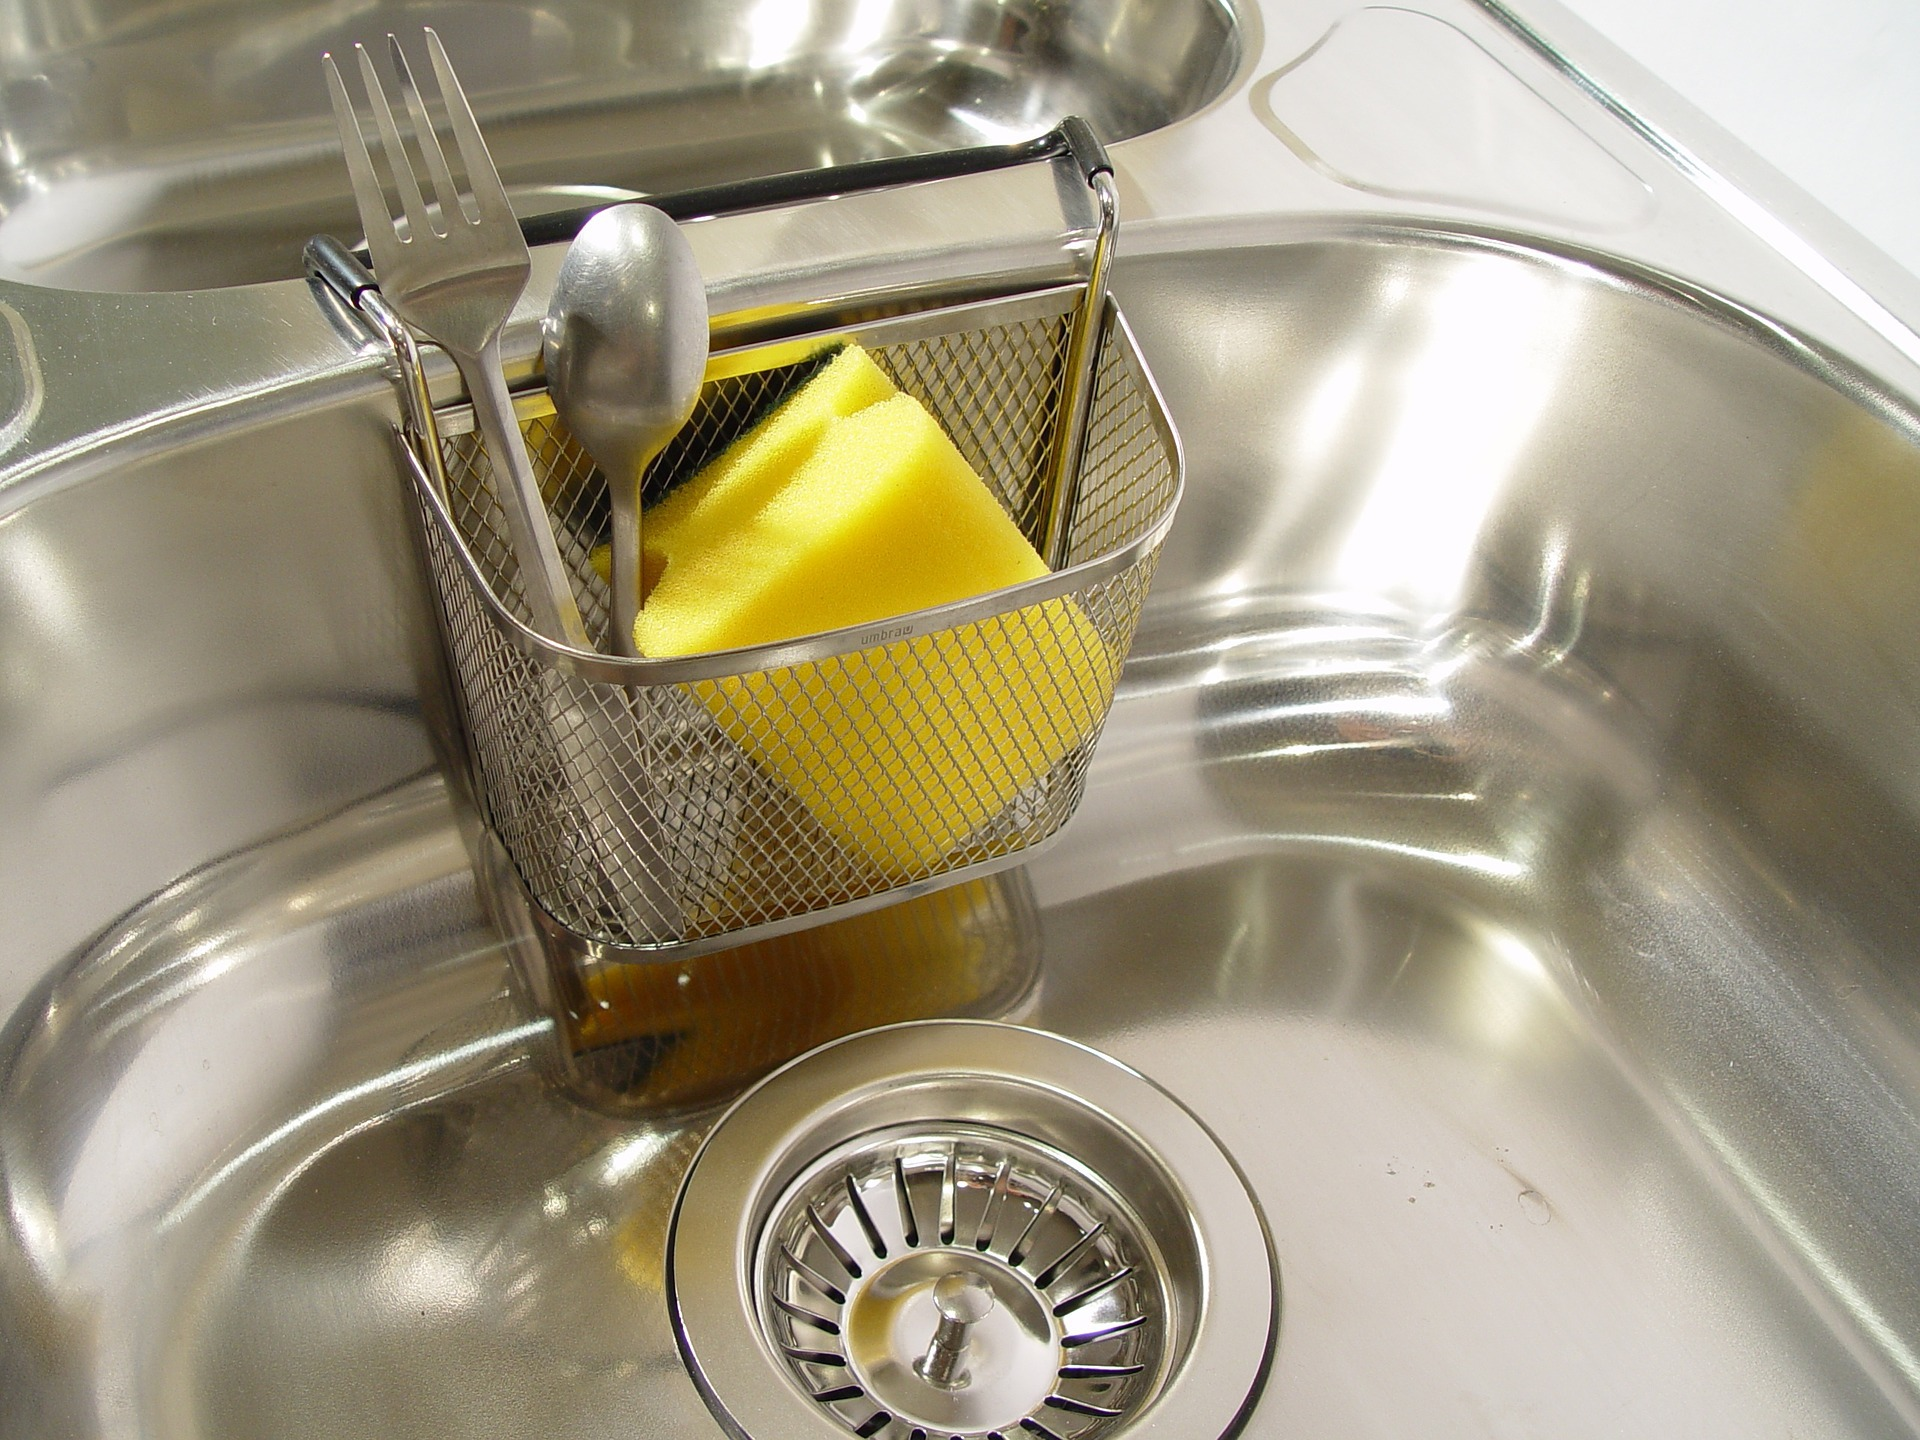 Cât de des trebuie să speli chiuveta?